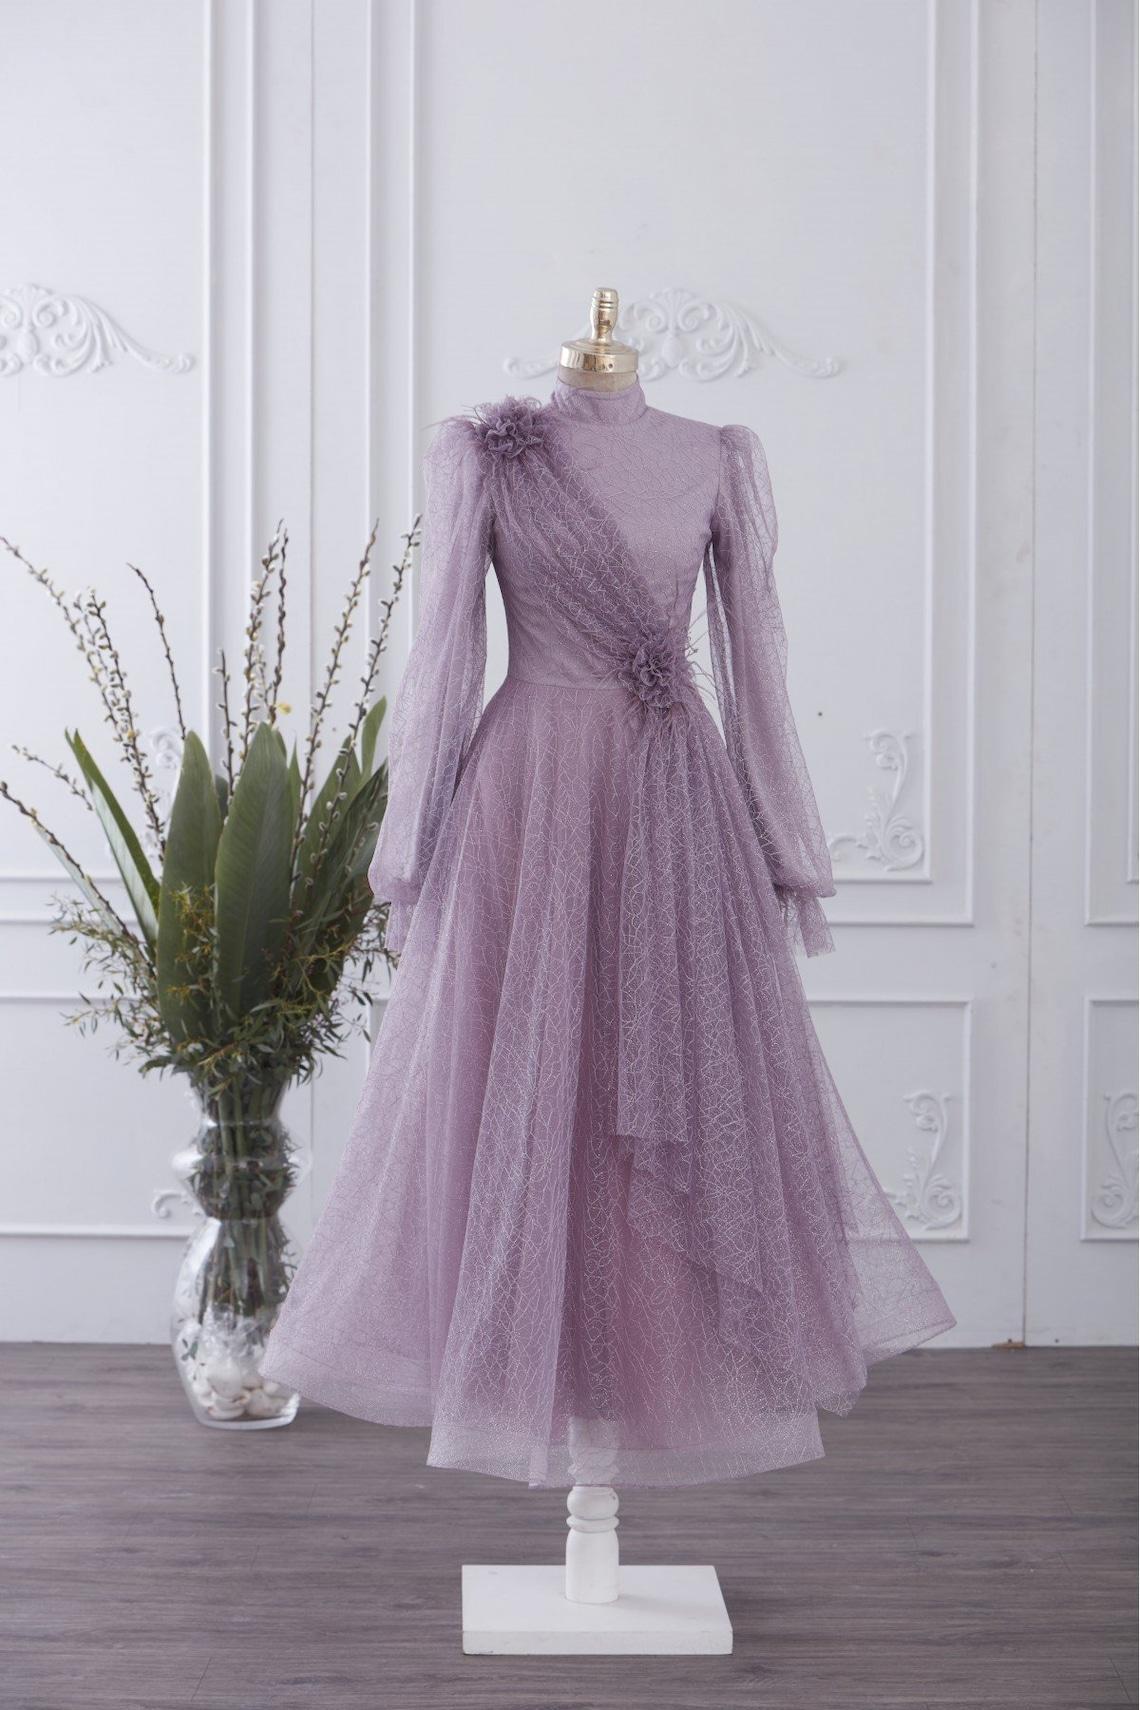 Vintage Style Dresses | Vintage Inspired Dresses Muslim Wedding Dress Long Dress Evening Gown Long Sleeve Maxi Dress Islamic Dress Nikah Outfit Hijab Bridesmaid Engagement Henna $217.80 AT vintagedancer.com